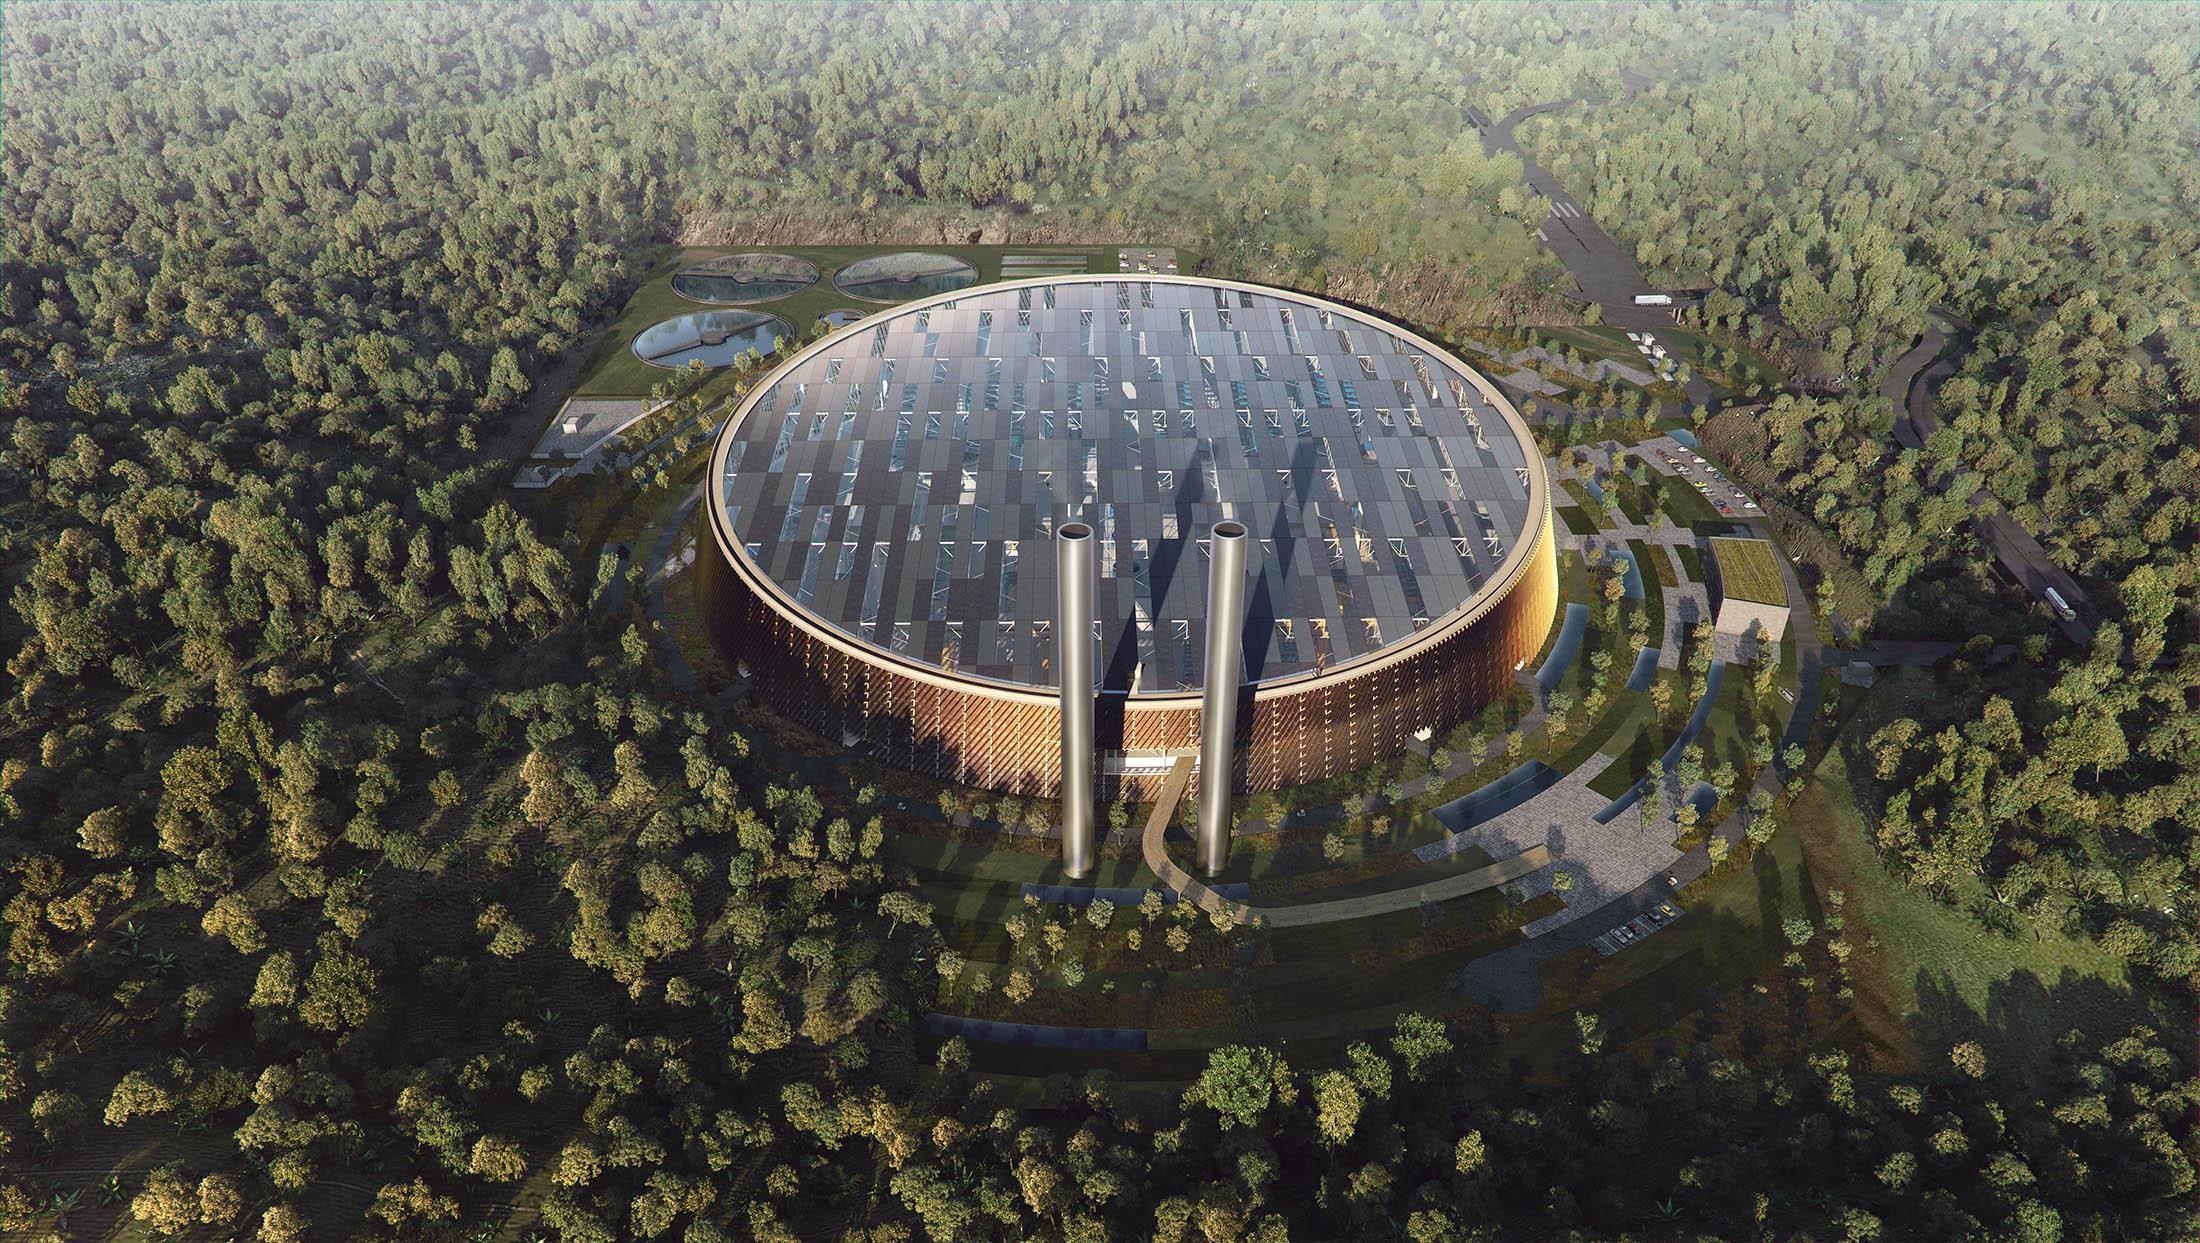 Schmidt Hammer Lassen, Waste-to-Energy Plant, China, 2016